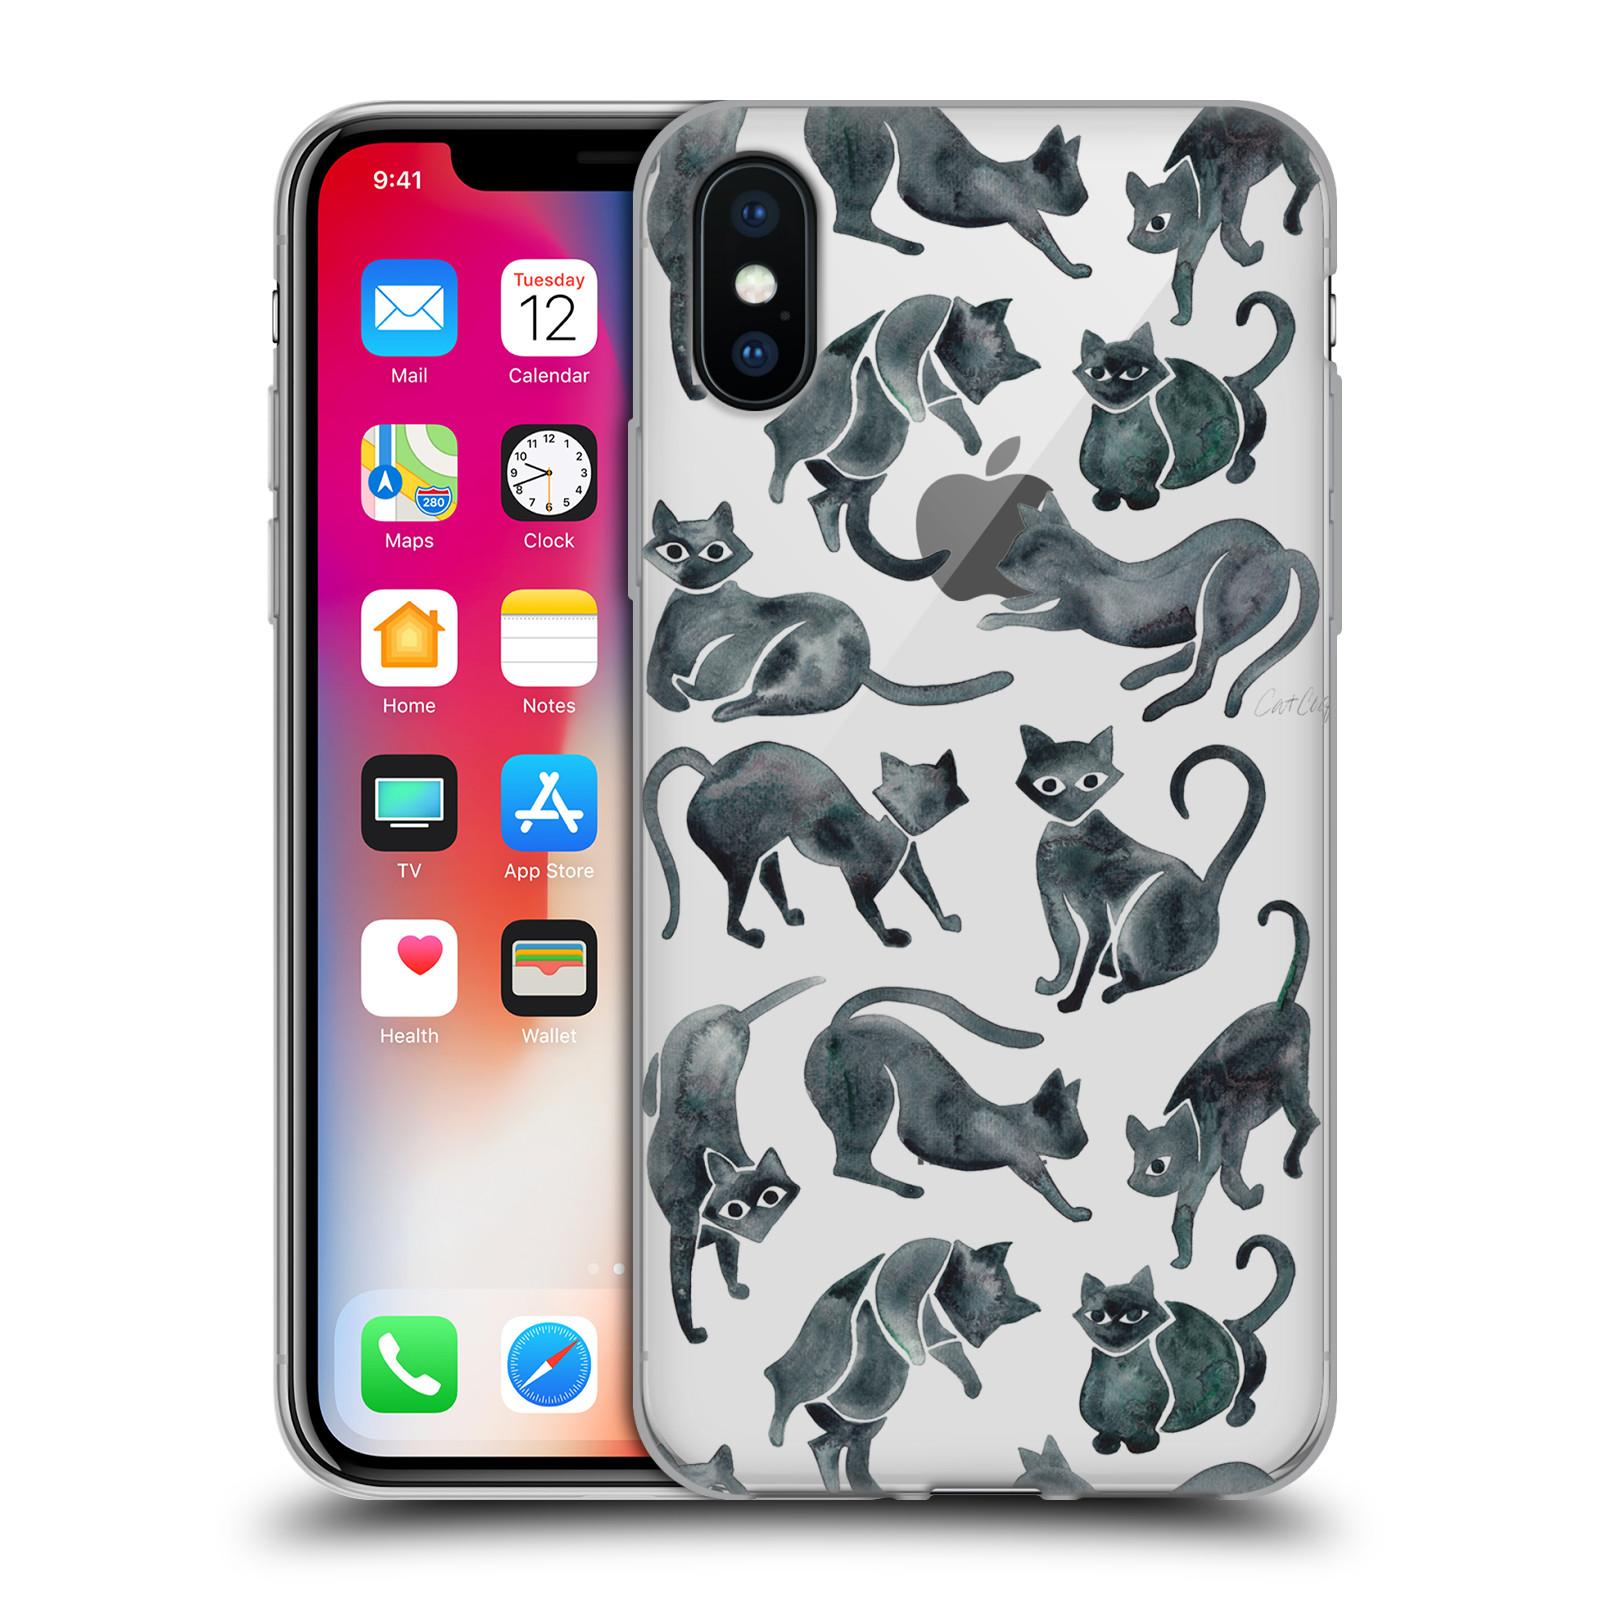 CAT-COQUILLETTE-ANIMAUX-3-ETUI-COQUE-EN-GEL-MOLLE-POUR-APPLE-iPHONE-TELEPHONES